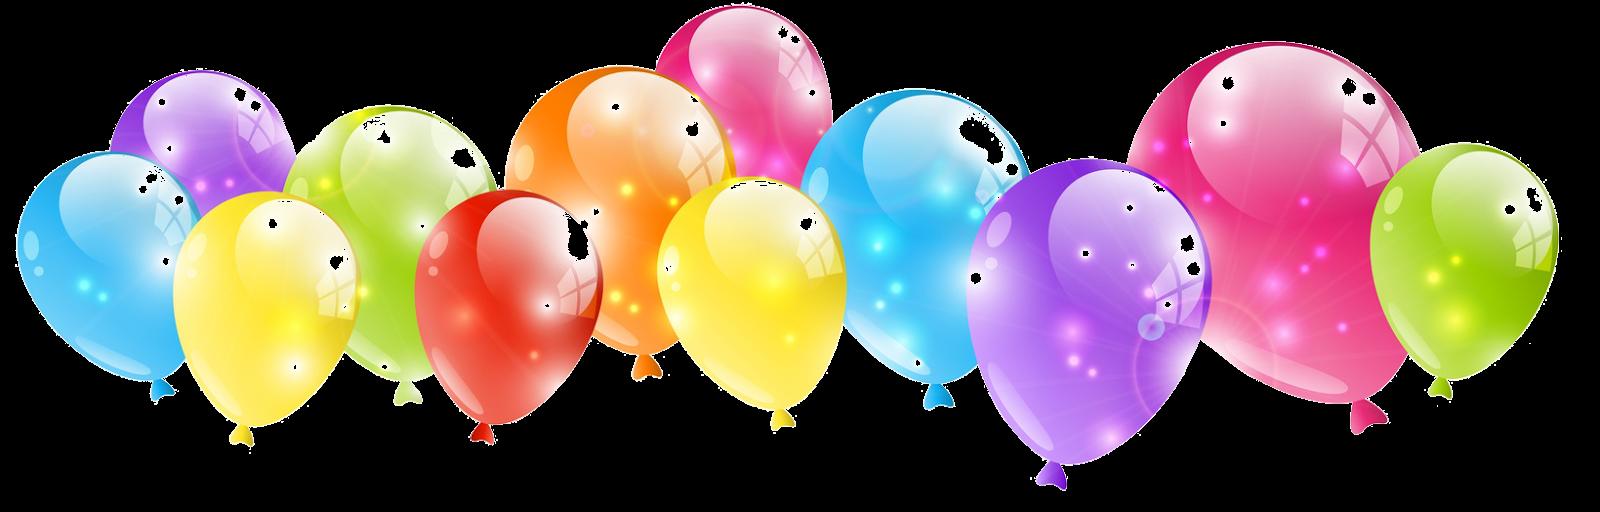 Bunte Luftballons PNG - 44213